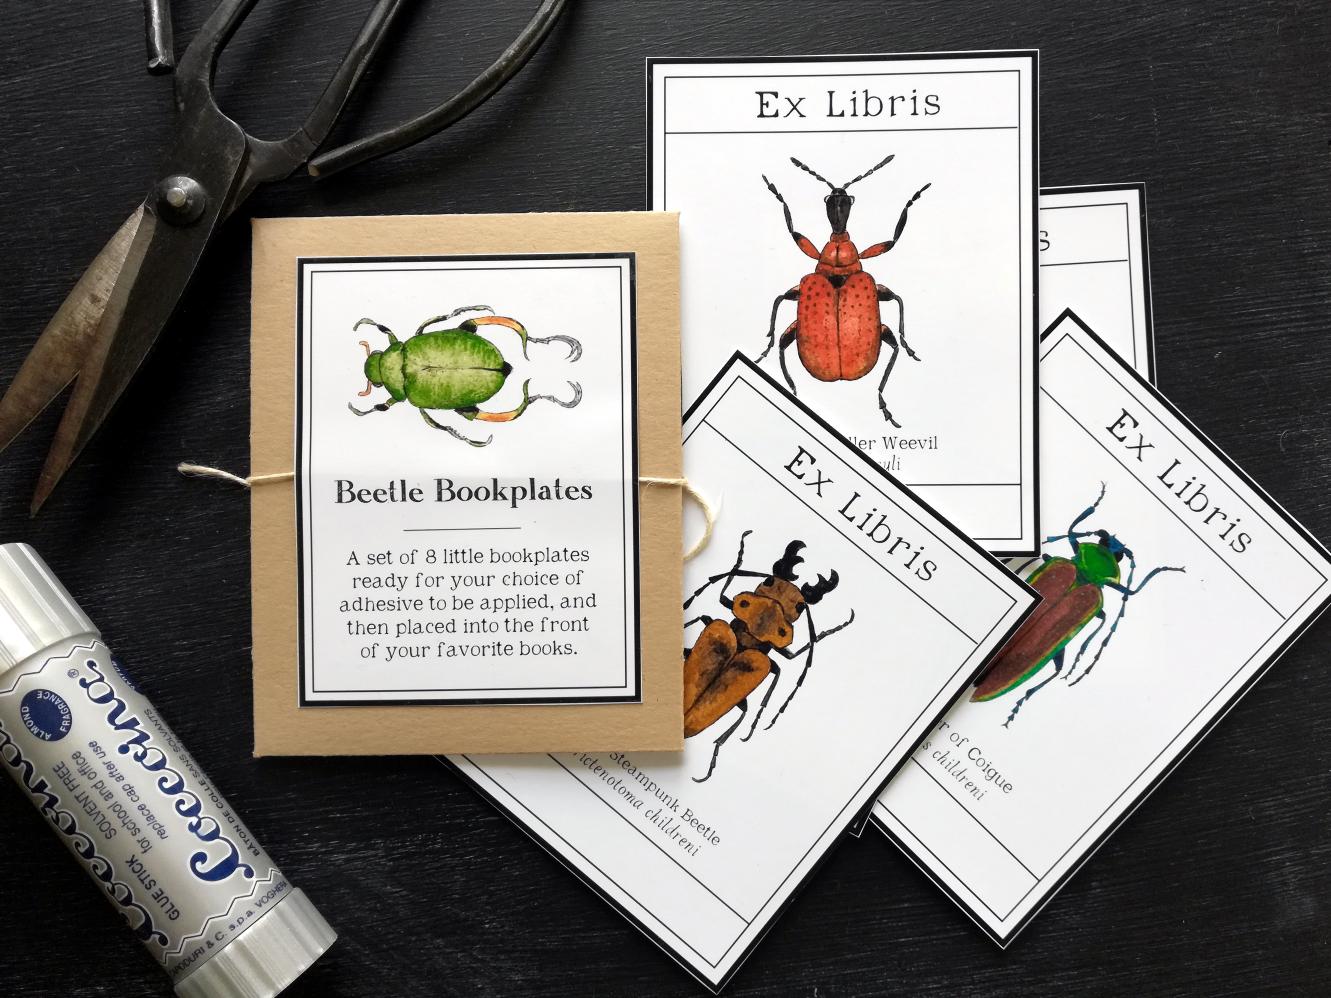 - Beetle Bookplates